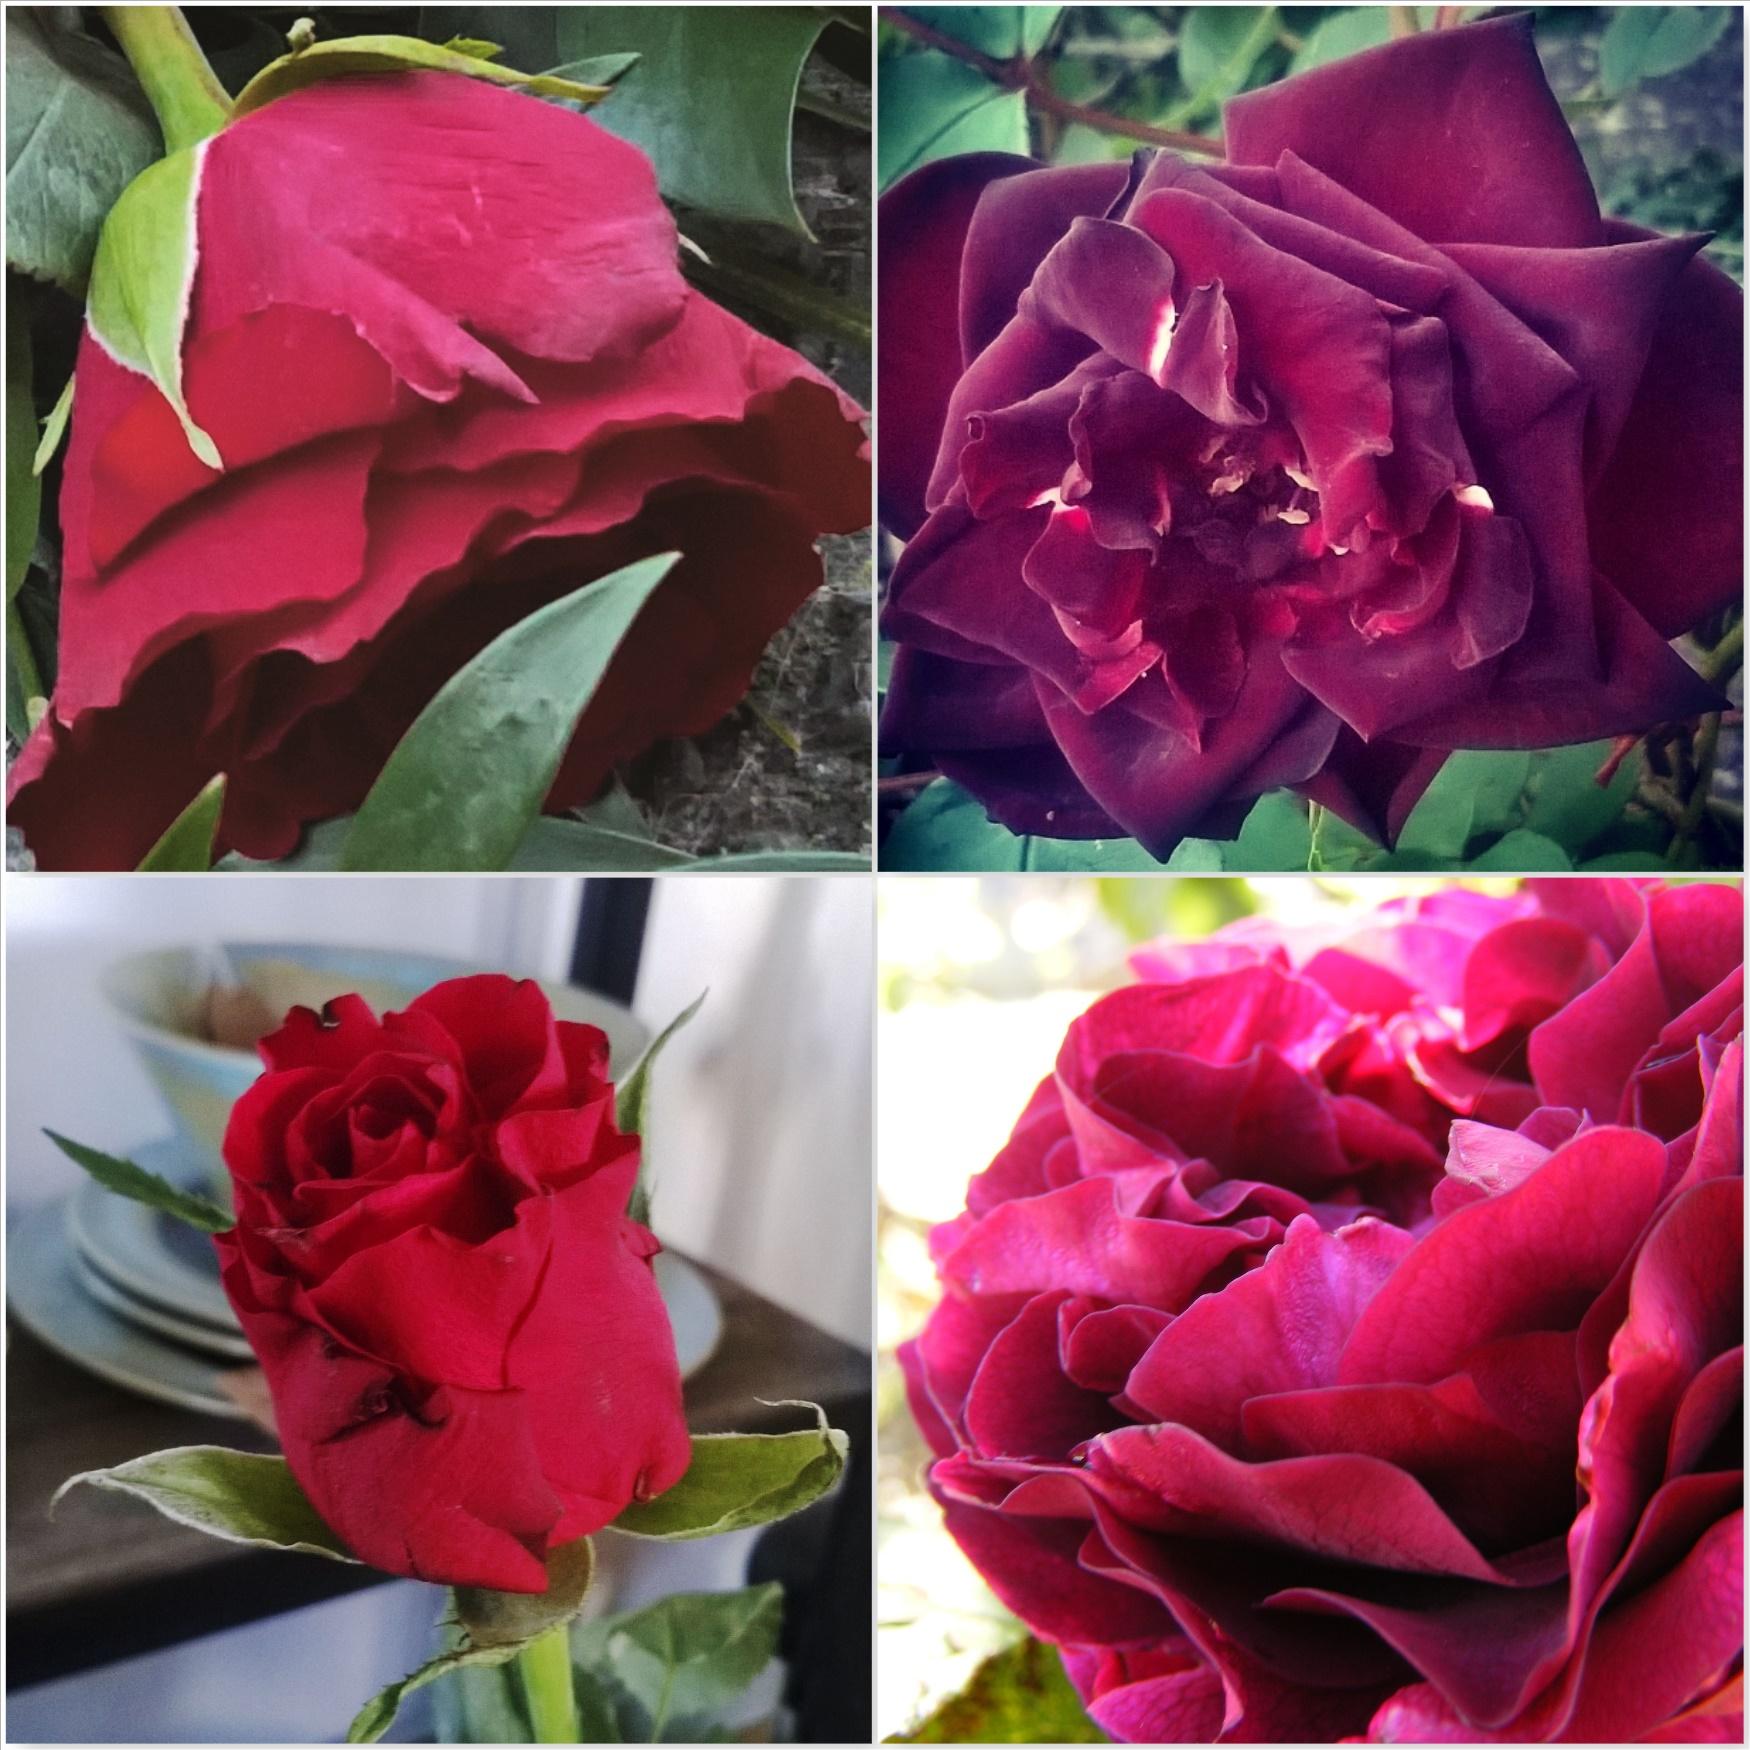 Red-Roses-The-Last-Krystallos